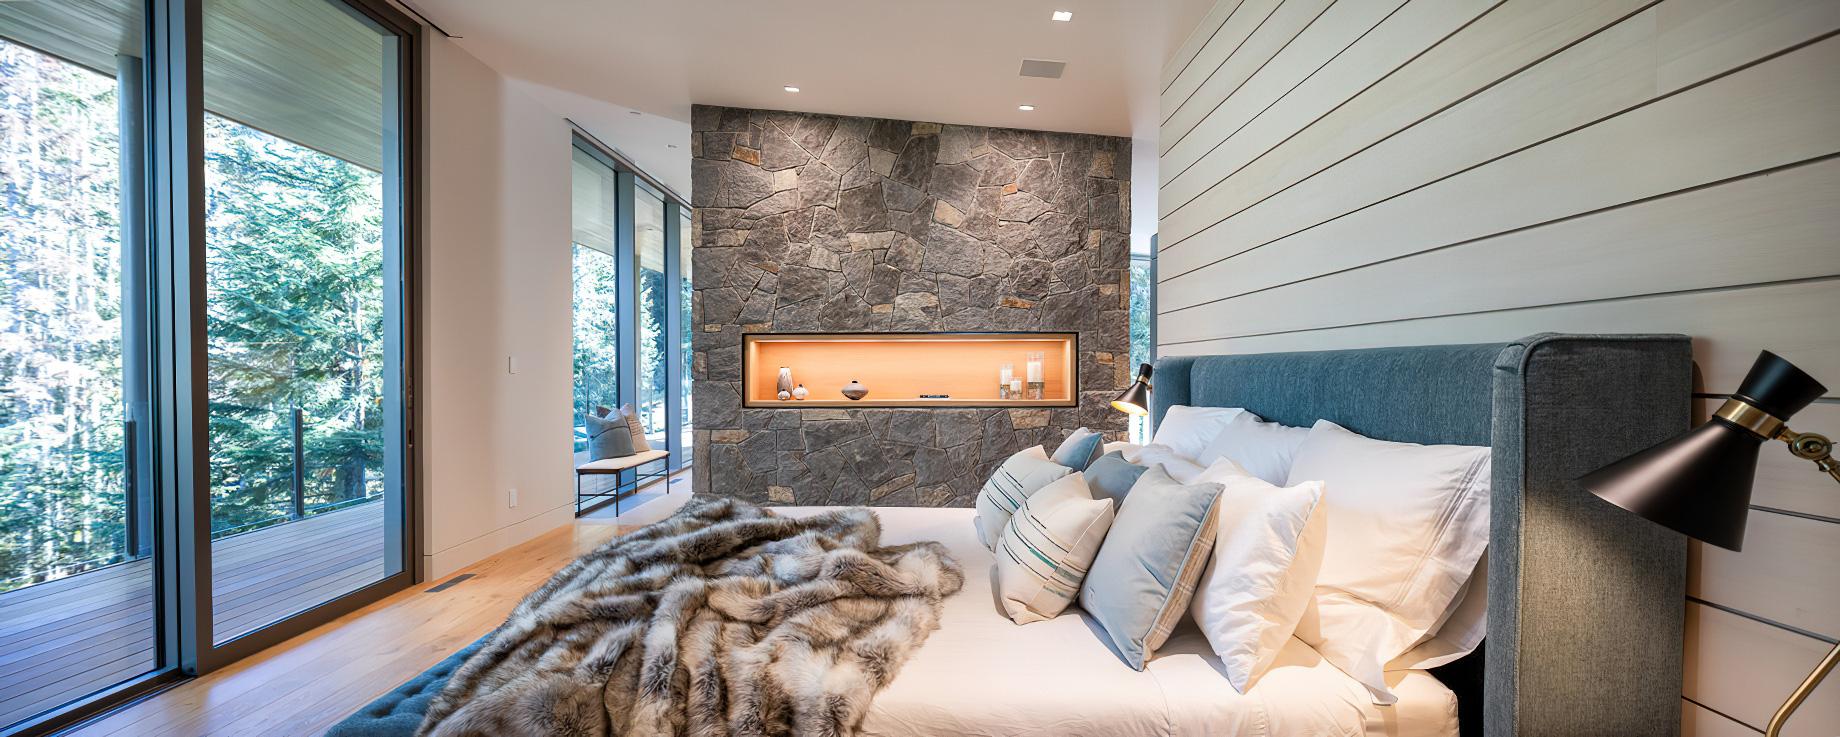 Trails Edge Palatial Luxury Ski Chalet Residence – Whistler, BC, Canada